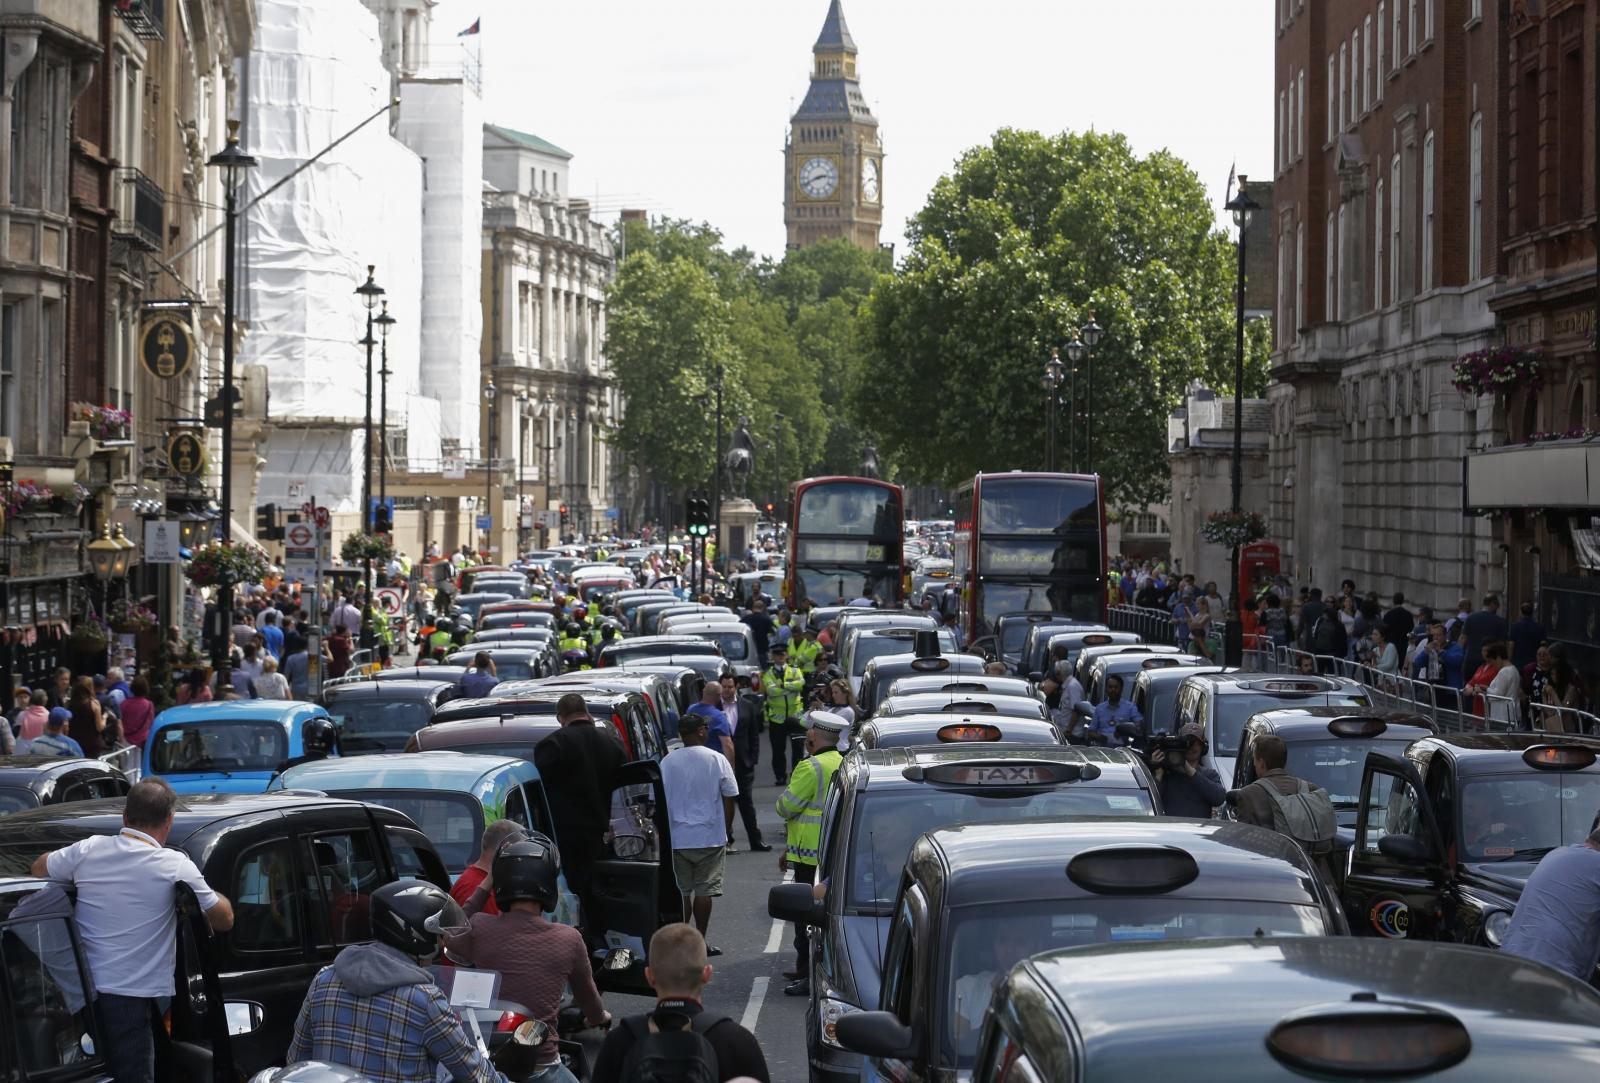 London's Cycle Hire Scheme - Centre for Public Impact (CPI)